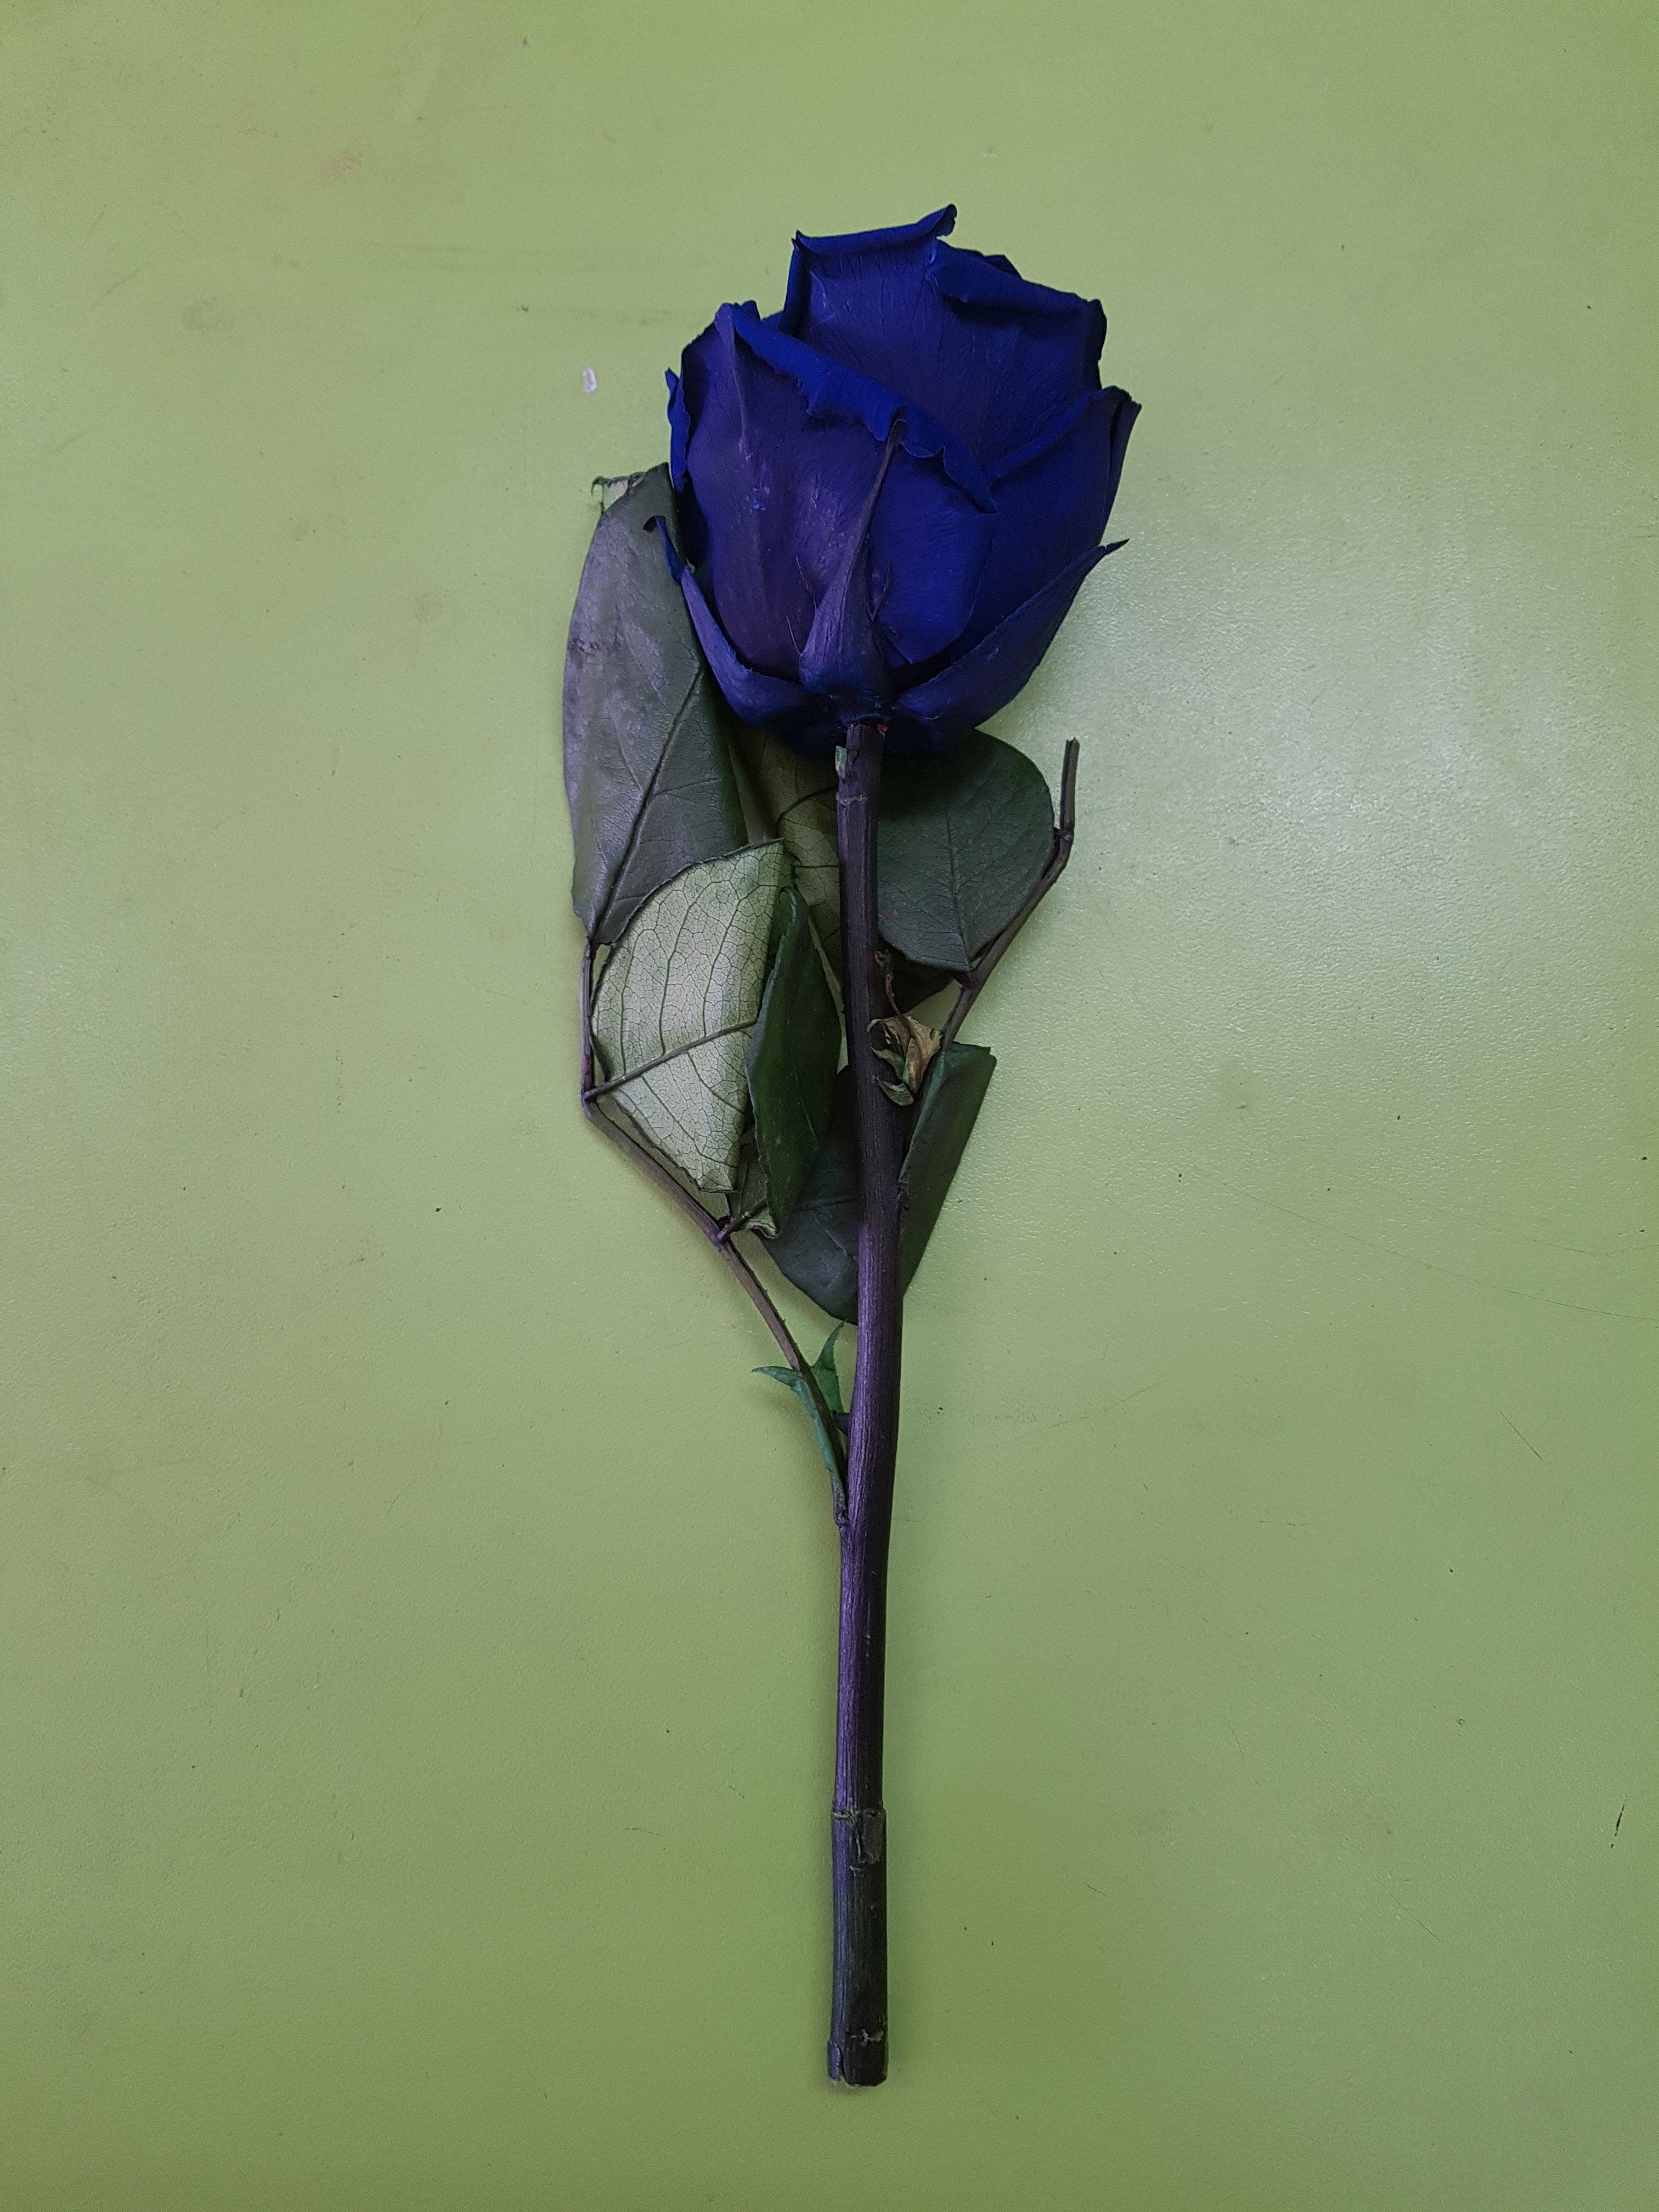 rosas azules preservadas al por mayor con tallo